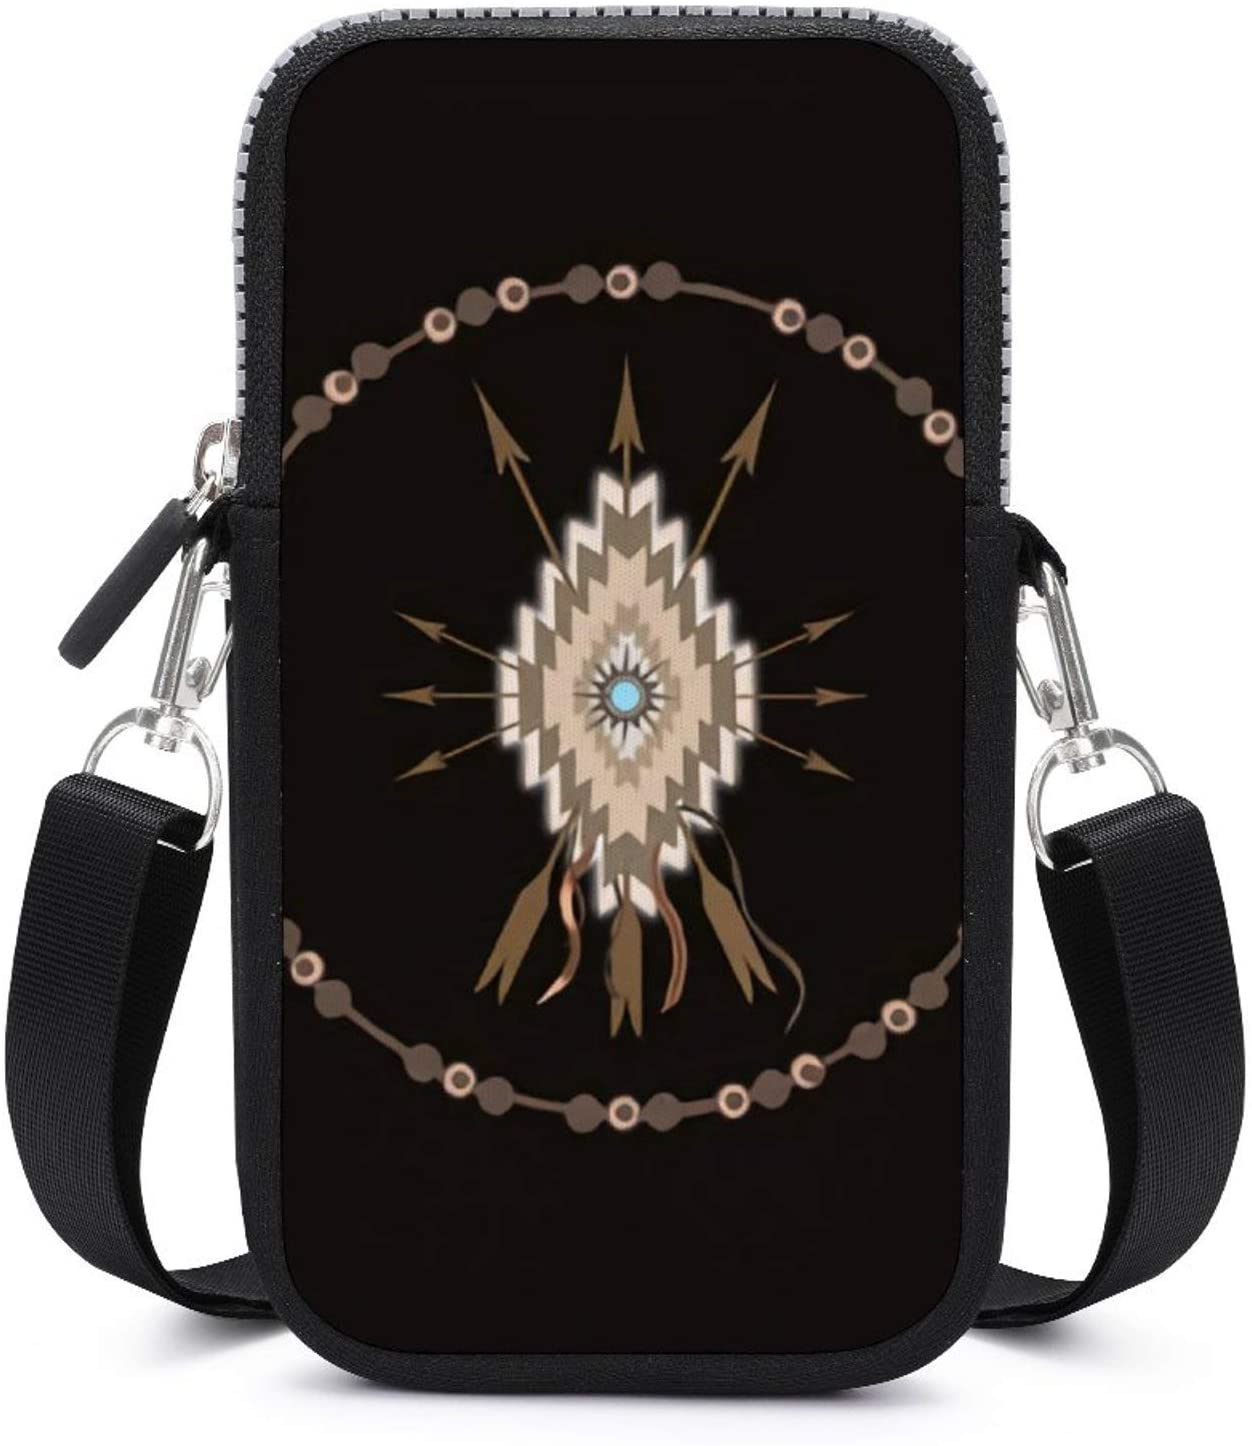 NiYoung Tribal Arrow Symbols Southwest Native American Crossbody Cell Phone Purse Bag Mini Cellphone Shoulder Bags Wallet for Women & Girls